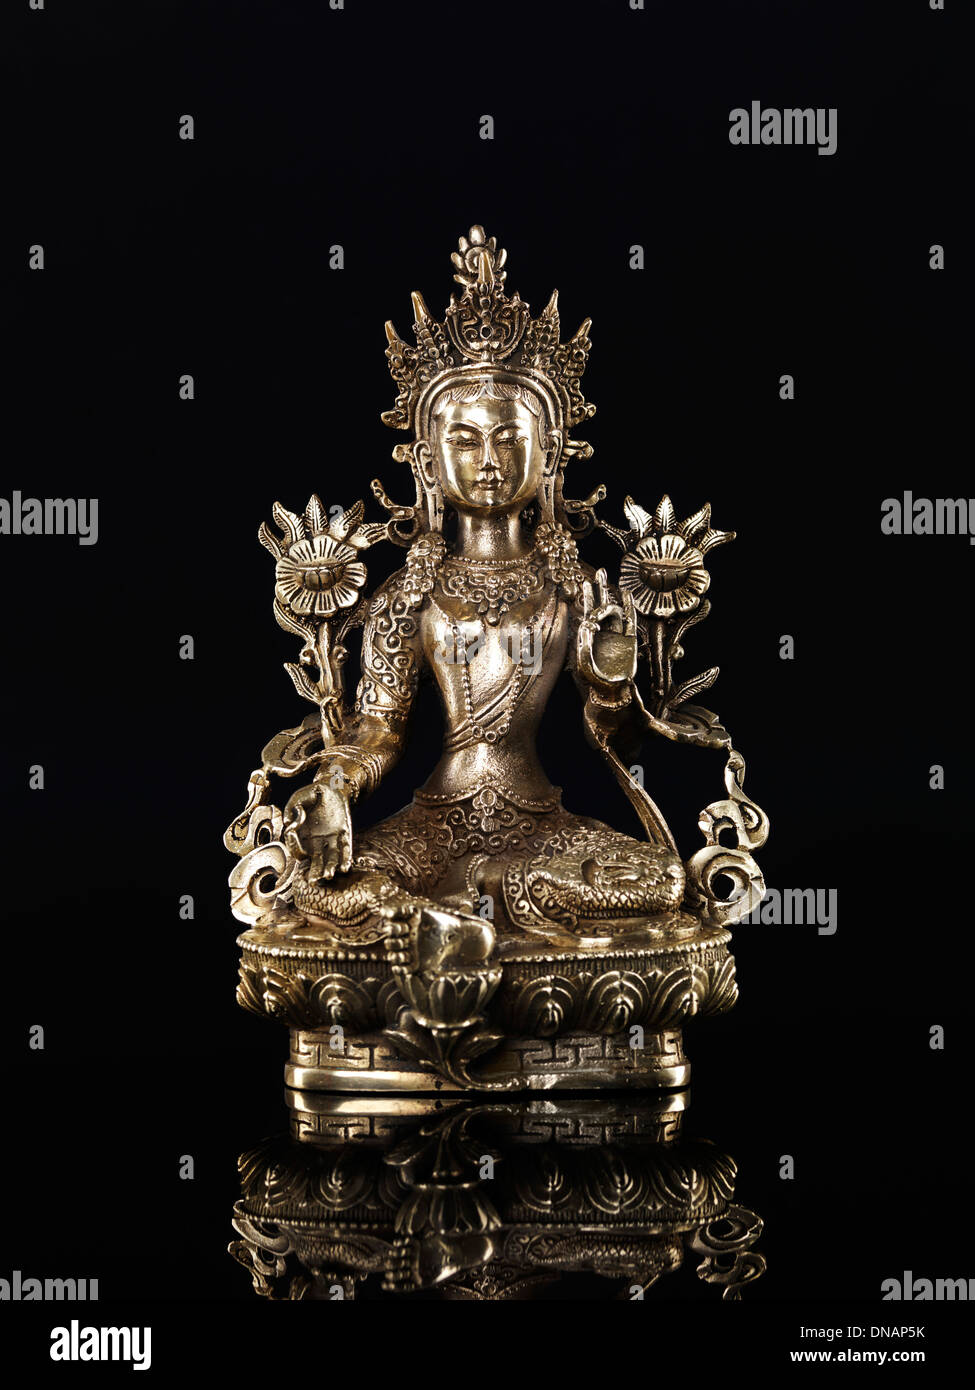 Green Tara statue Buddhist goddess of compassion. Isolated on black background. - Stock Image